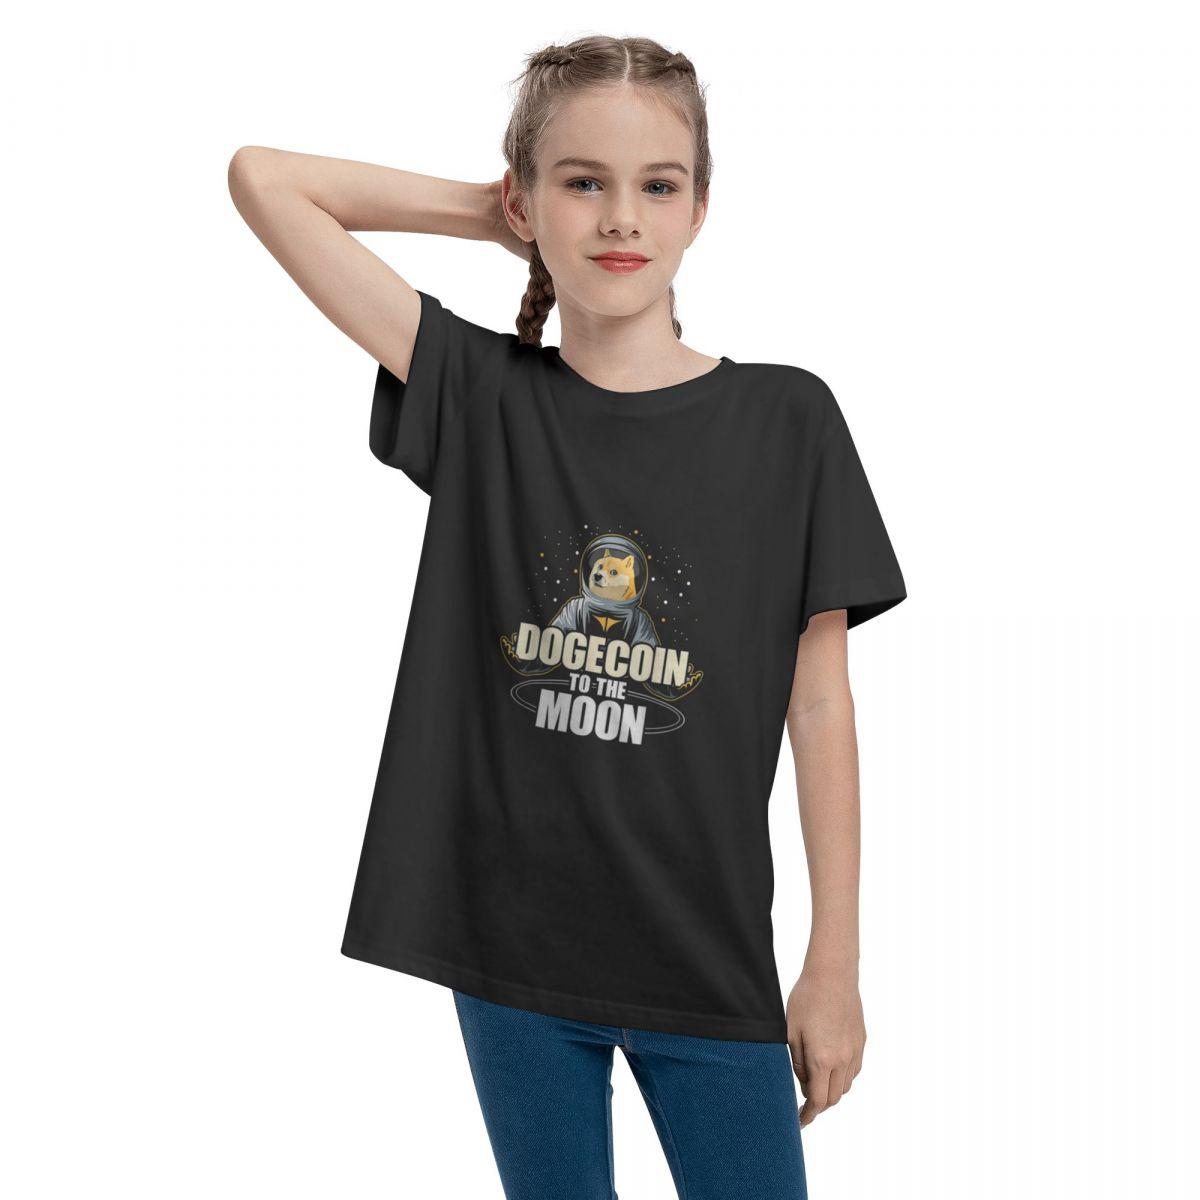 Dogecoin To The Moon Doge HODL Rocket Crypto Meme Teenage T-shirt Unisex Comfortable Fashion Summer Tops 100% Cotton